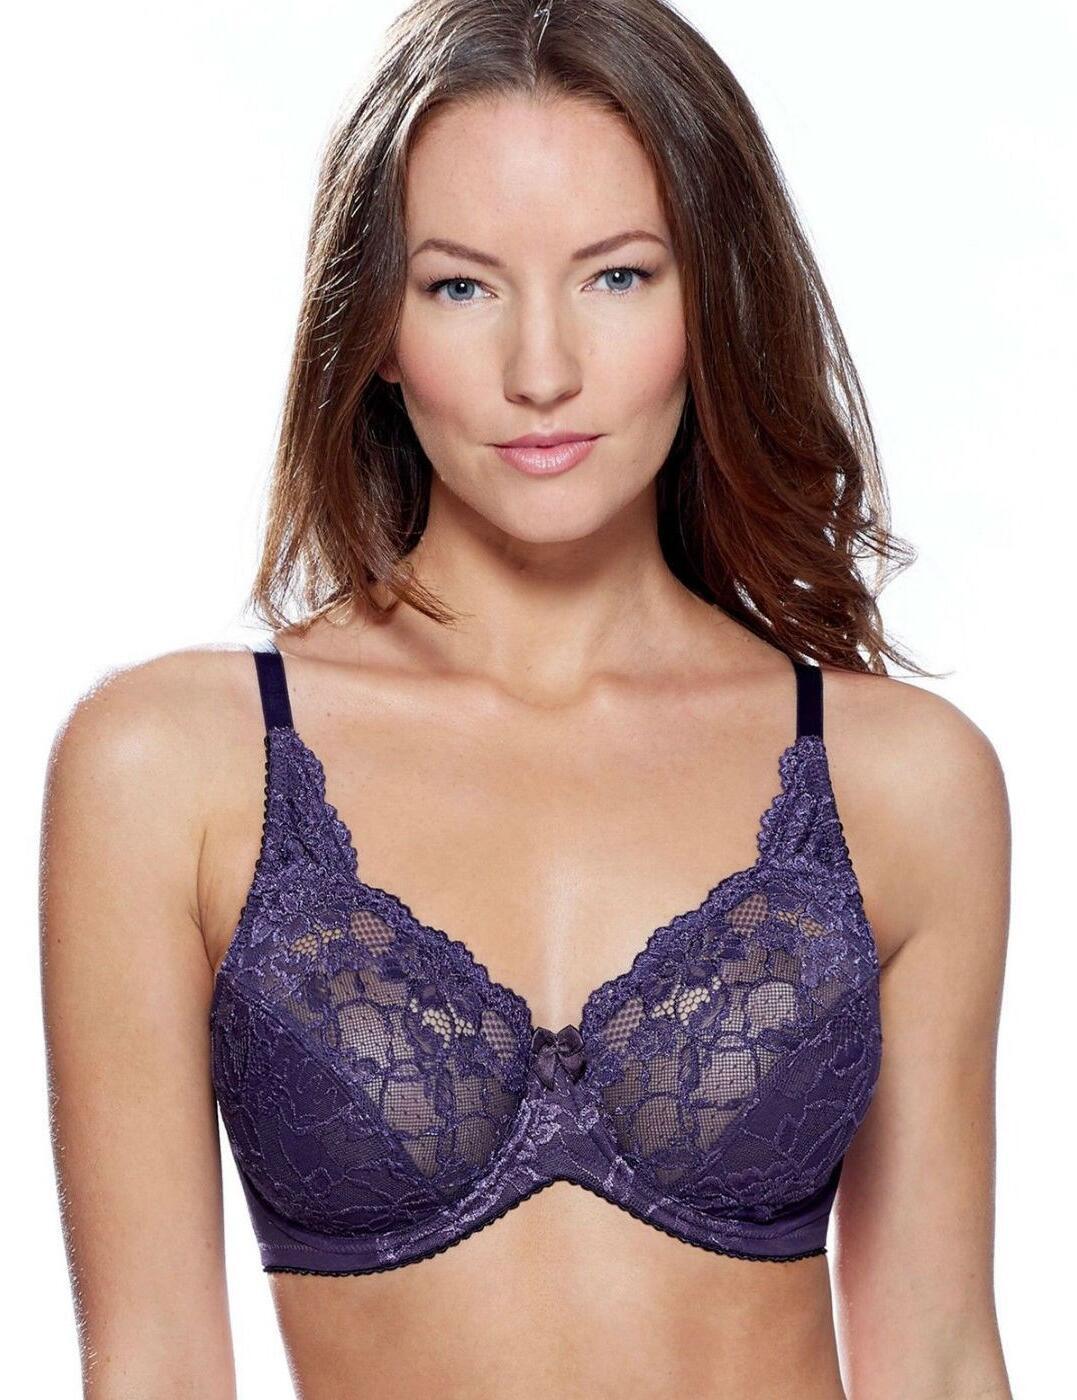 5204c870b2 Charnos Rosalind Full Cup Bra Purple - Belle Lingerie